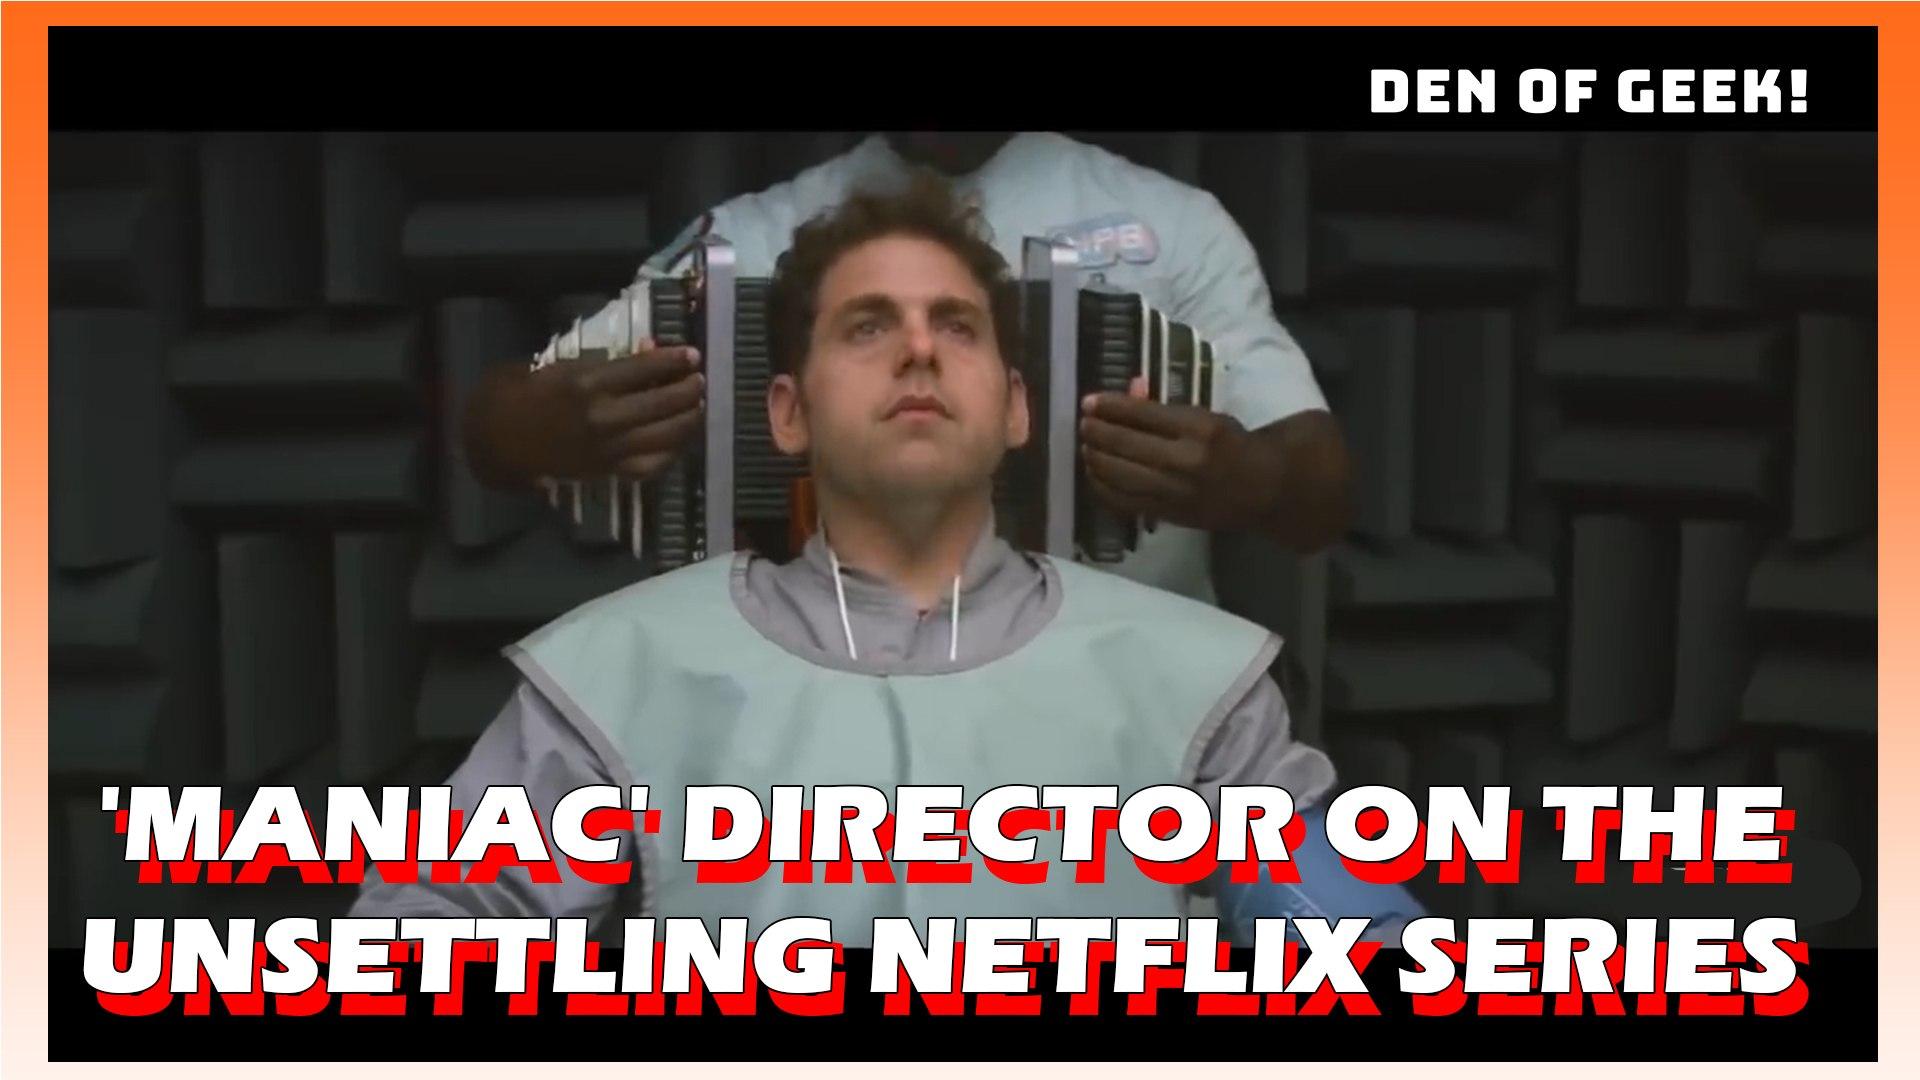 Maniac - Cary Fukunaga Describes the Unsettling Netflix Series